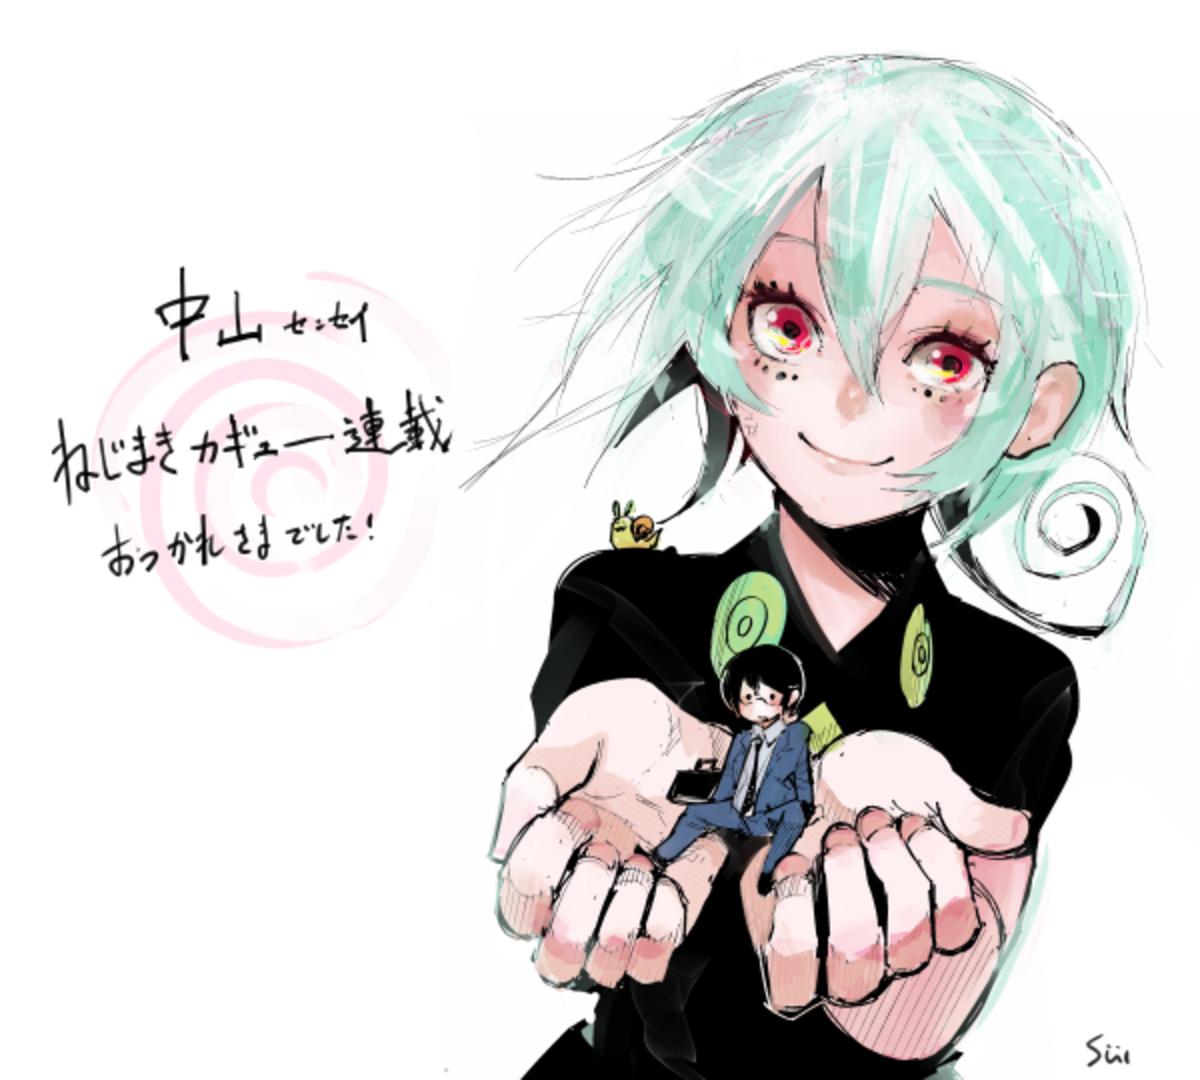 Ishida Sui's return gift for Atsushi Nakayama, creator of Nejimaki Kagyu.